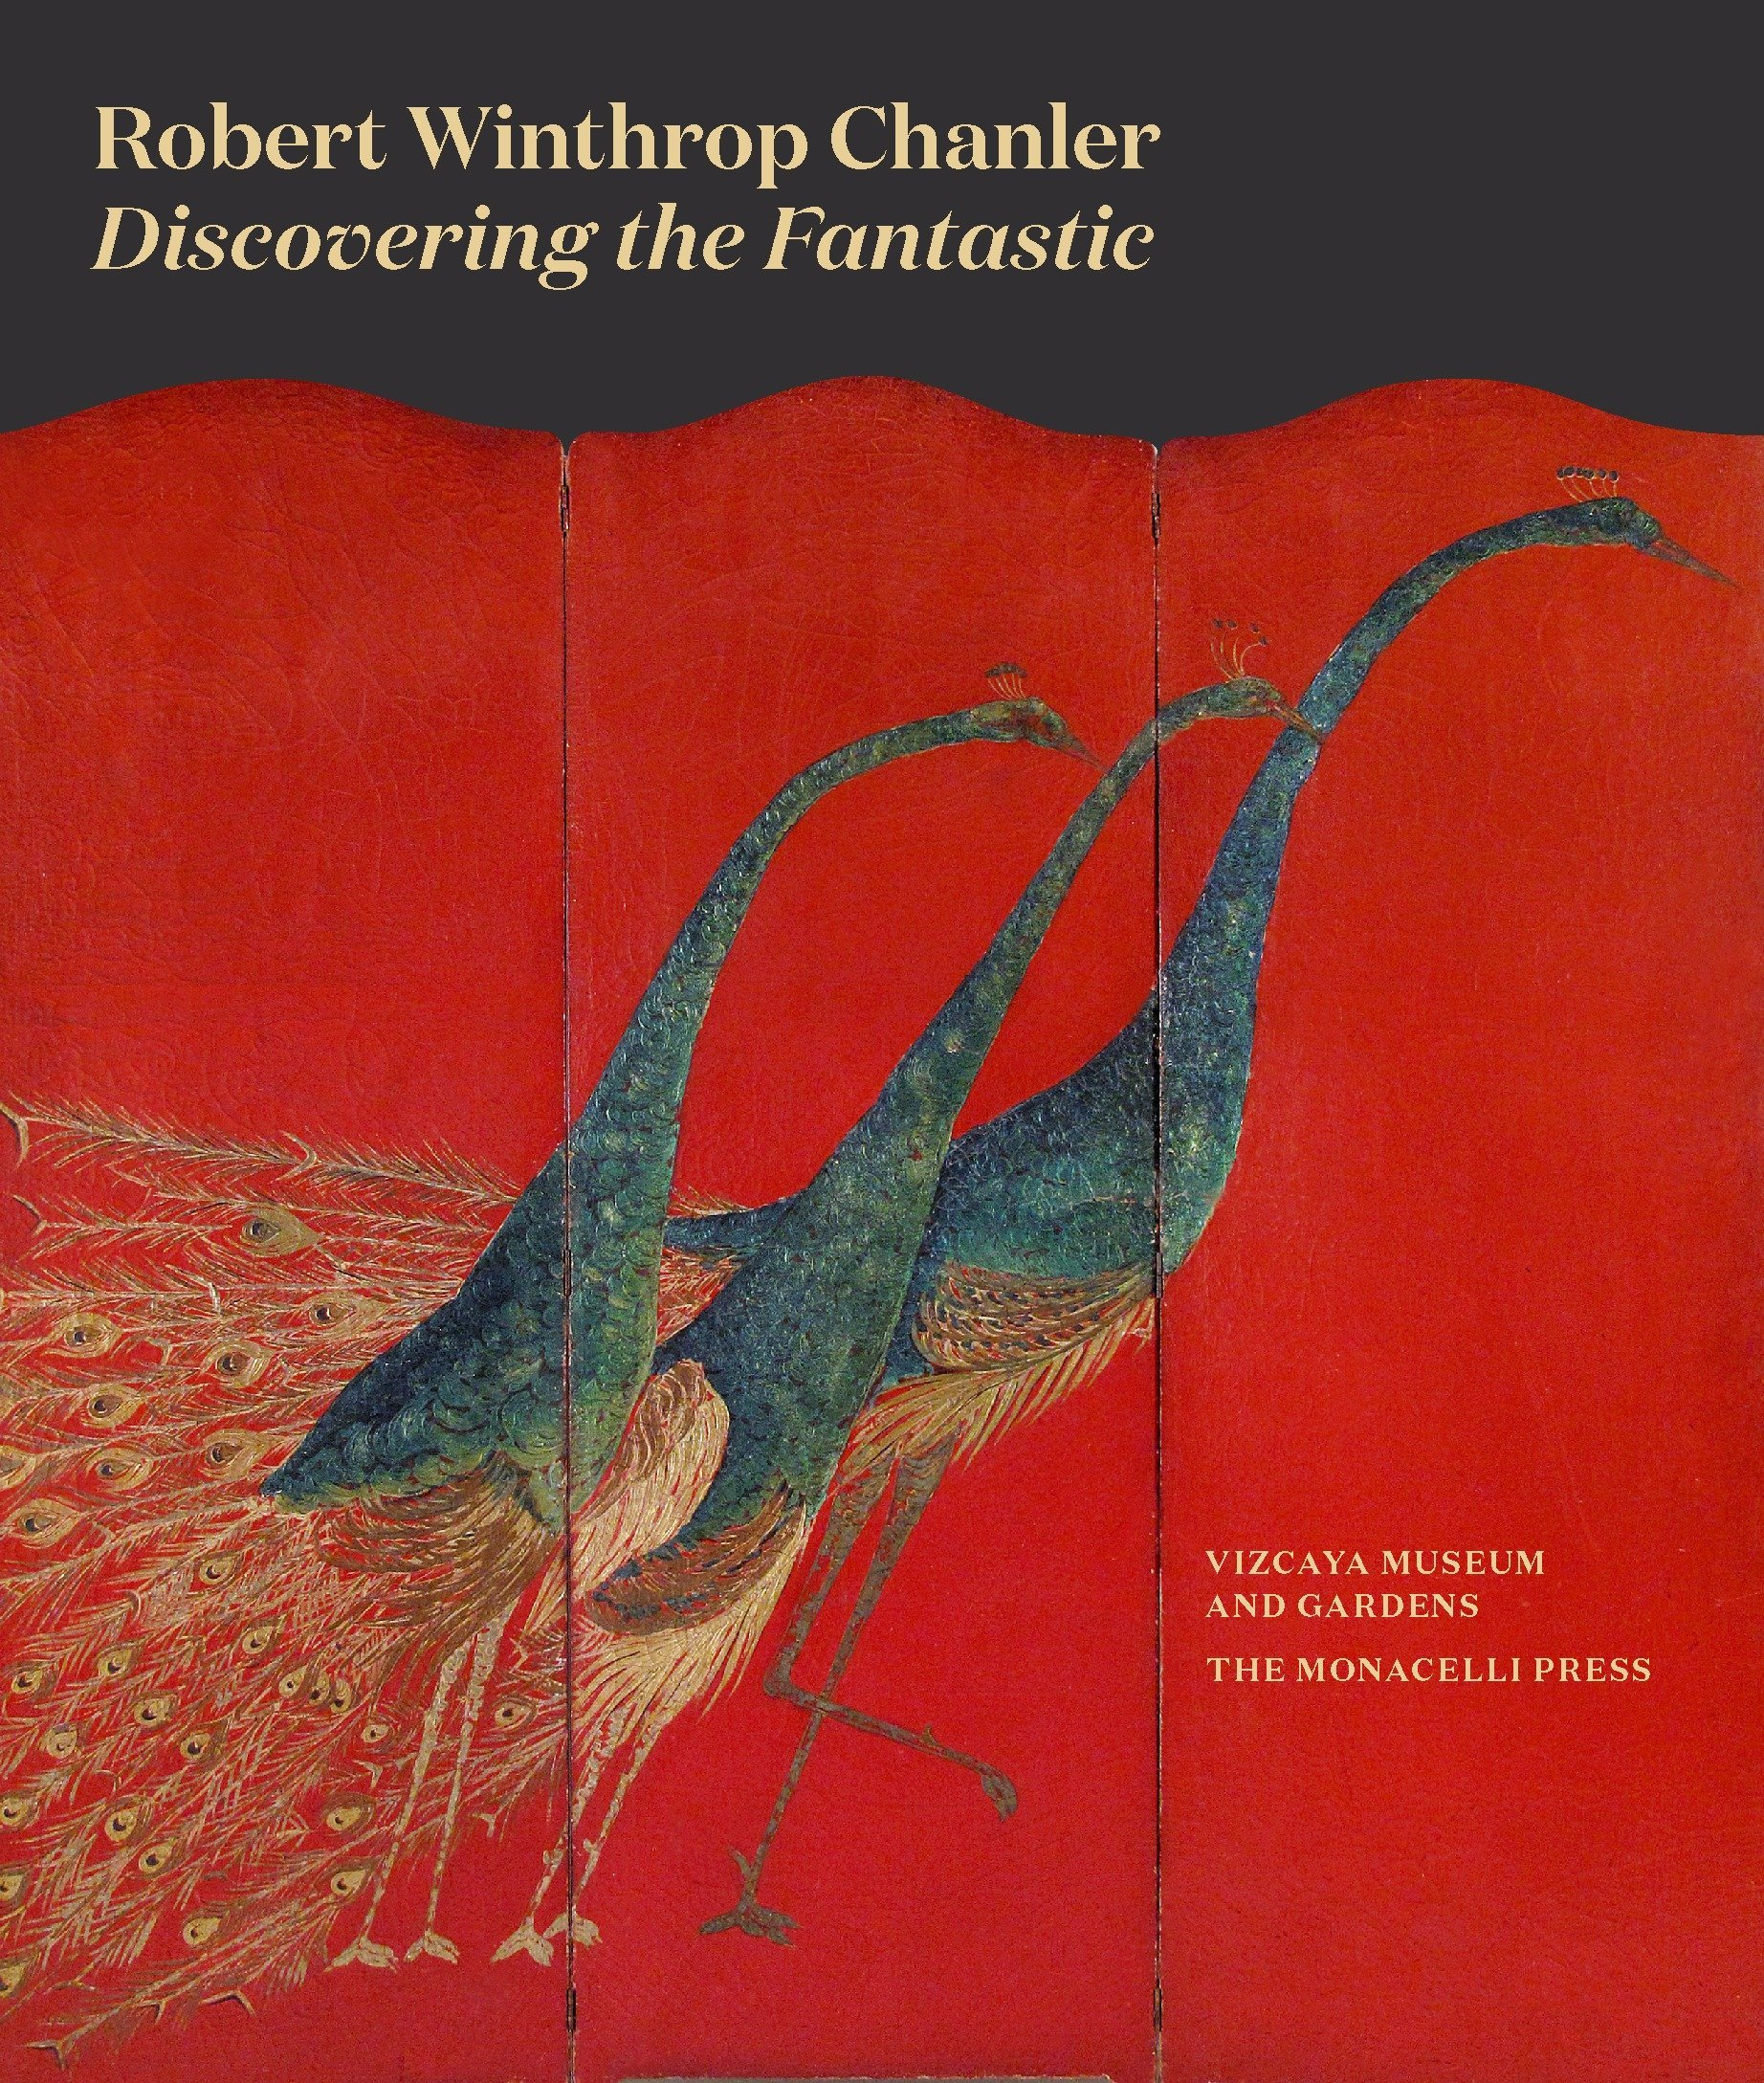 Robert Winthrop Chanler: Discovering the Fantastic: Gina